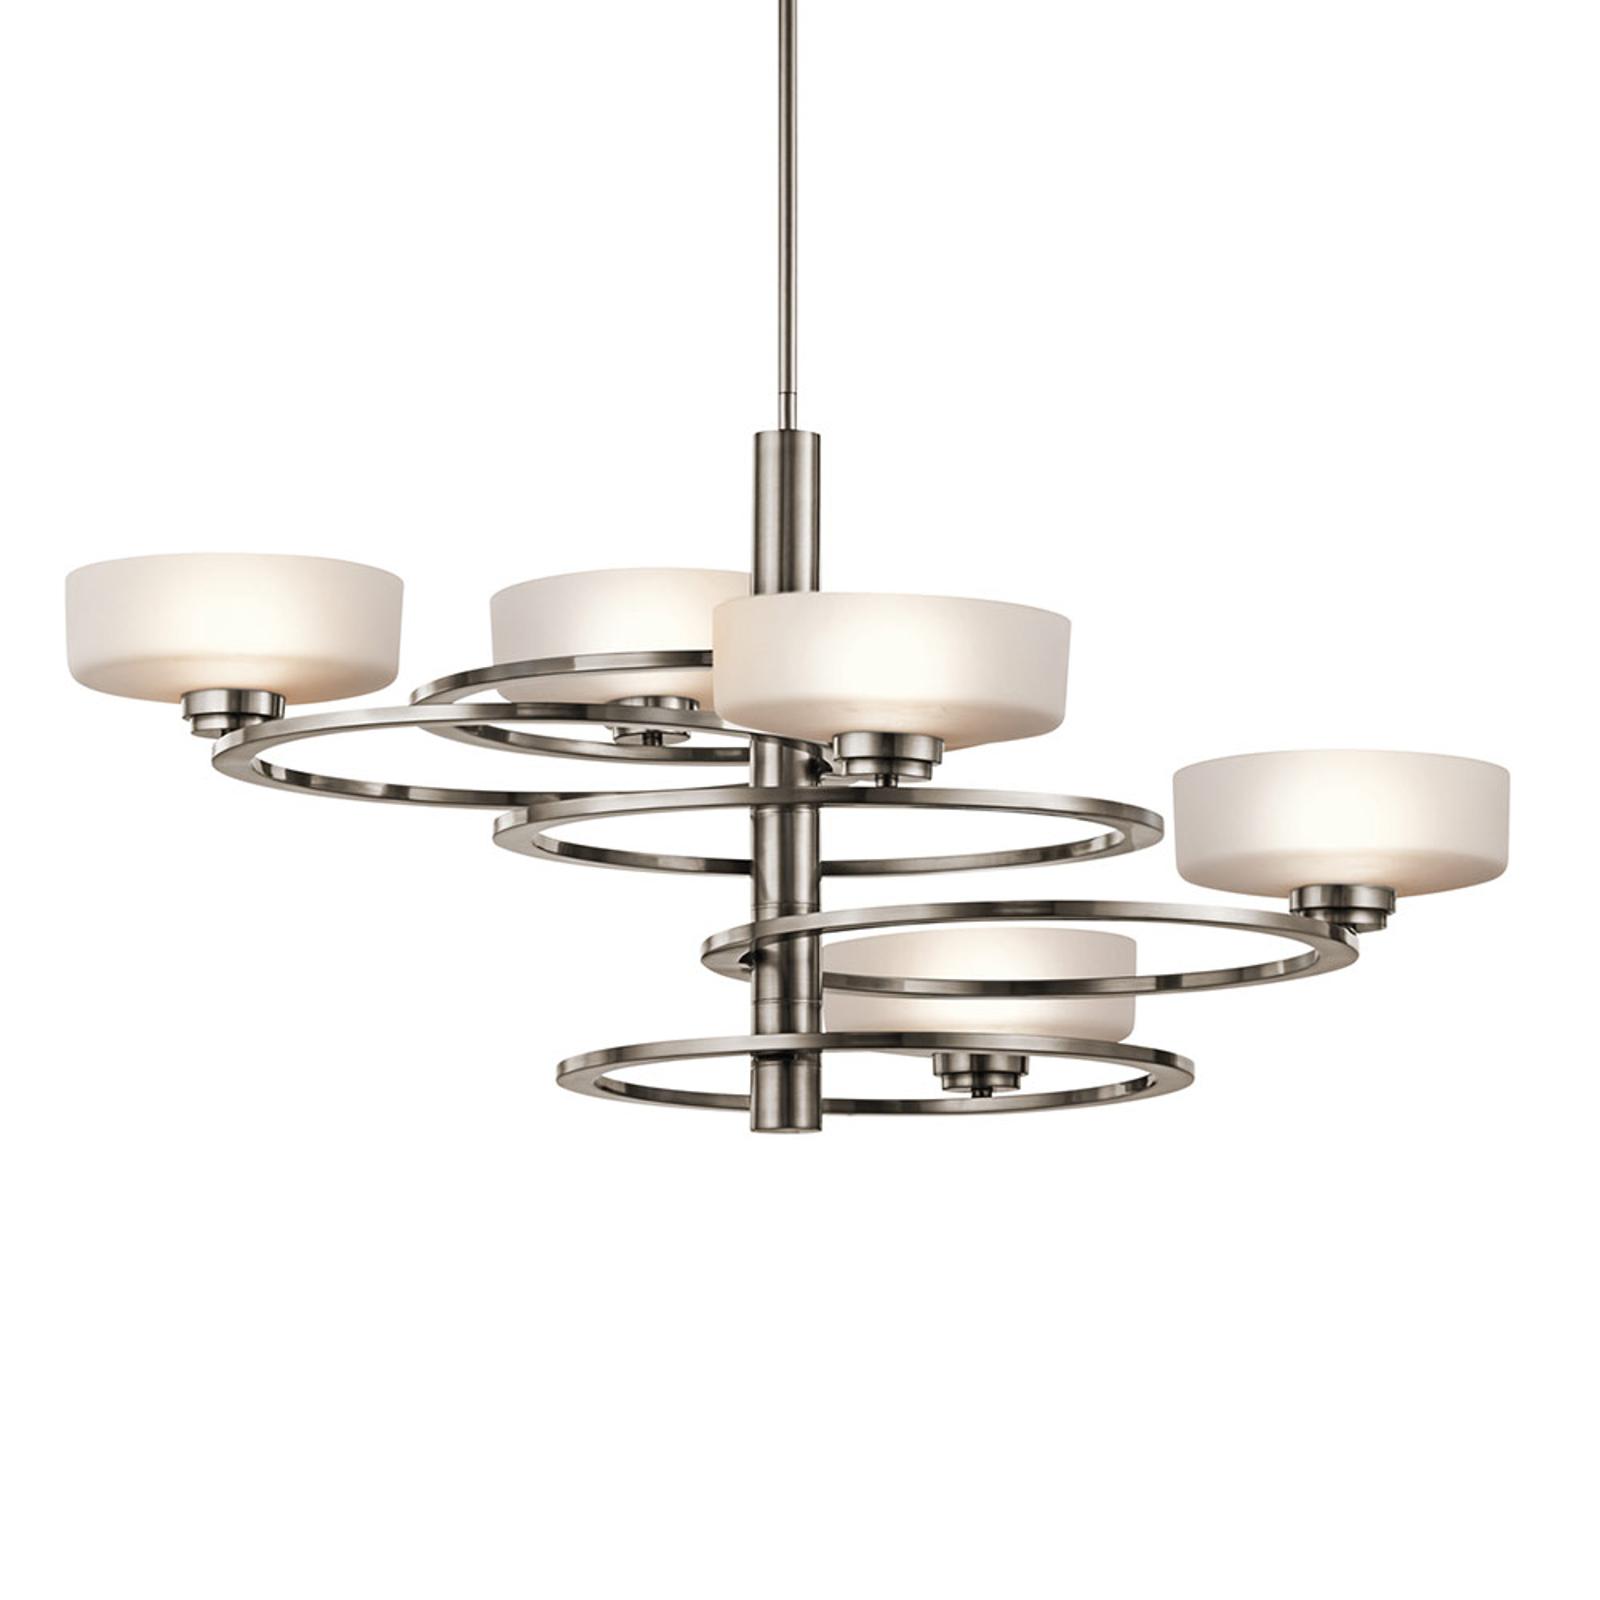 Lampa wisząca LED Aleeka 5-punktowa, 43,8 cm